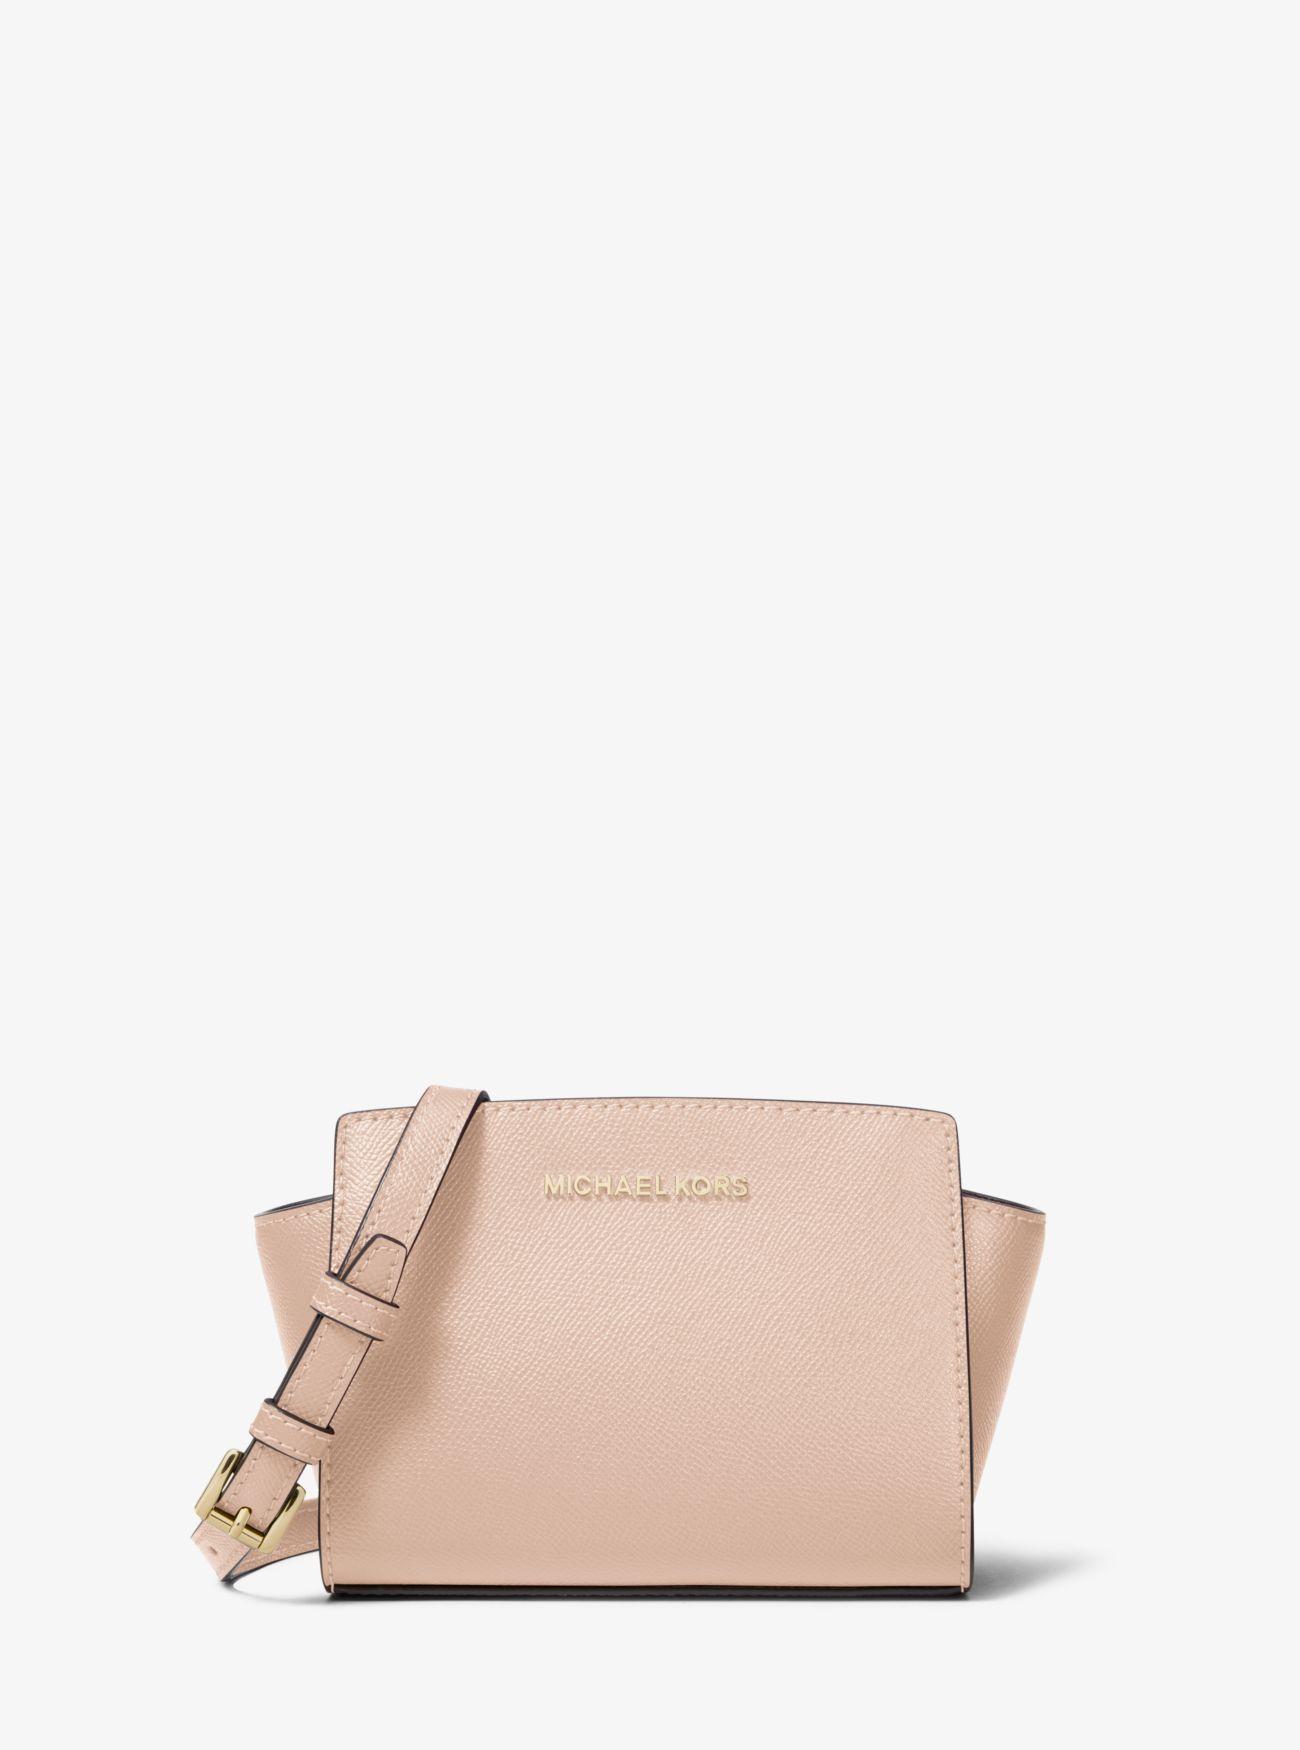 97c921ae7409 MICHAEL Michael Kors. Women's Pink Selma Mini Saffiano Leather Crossbody